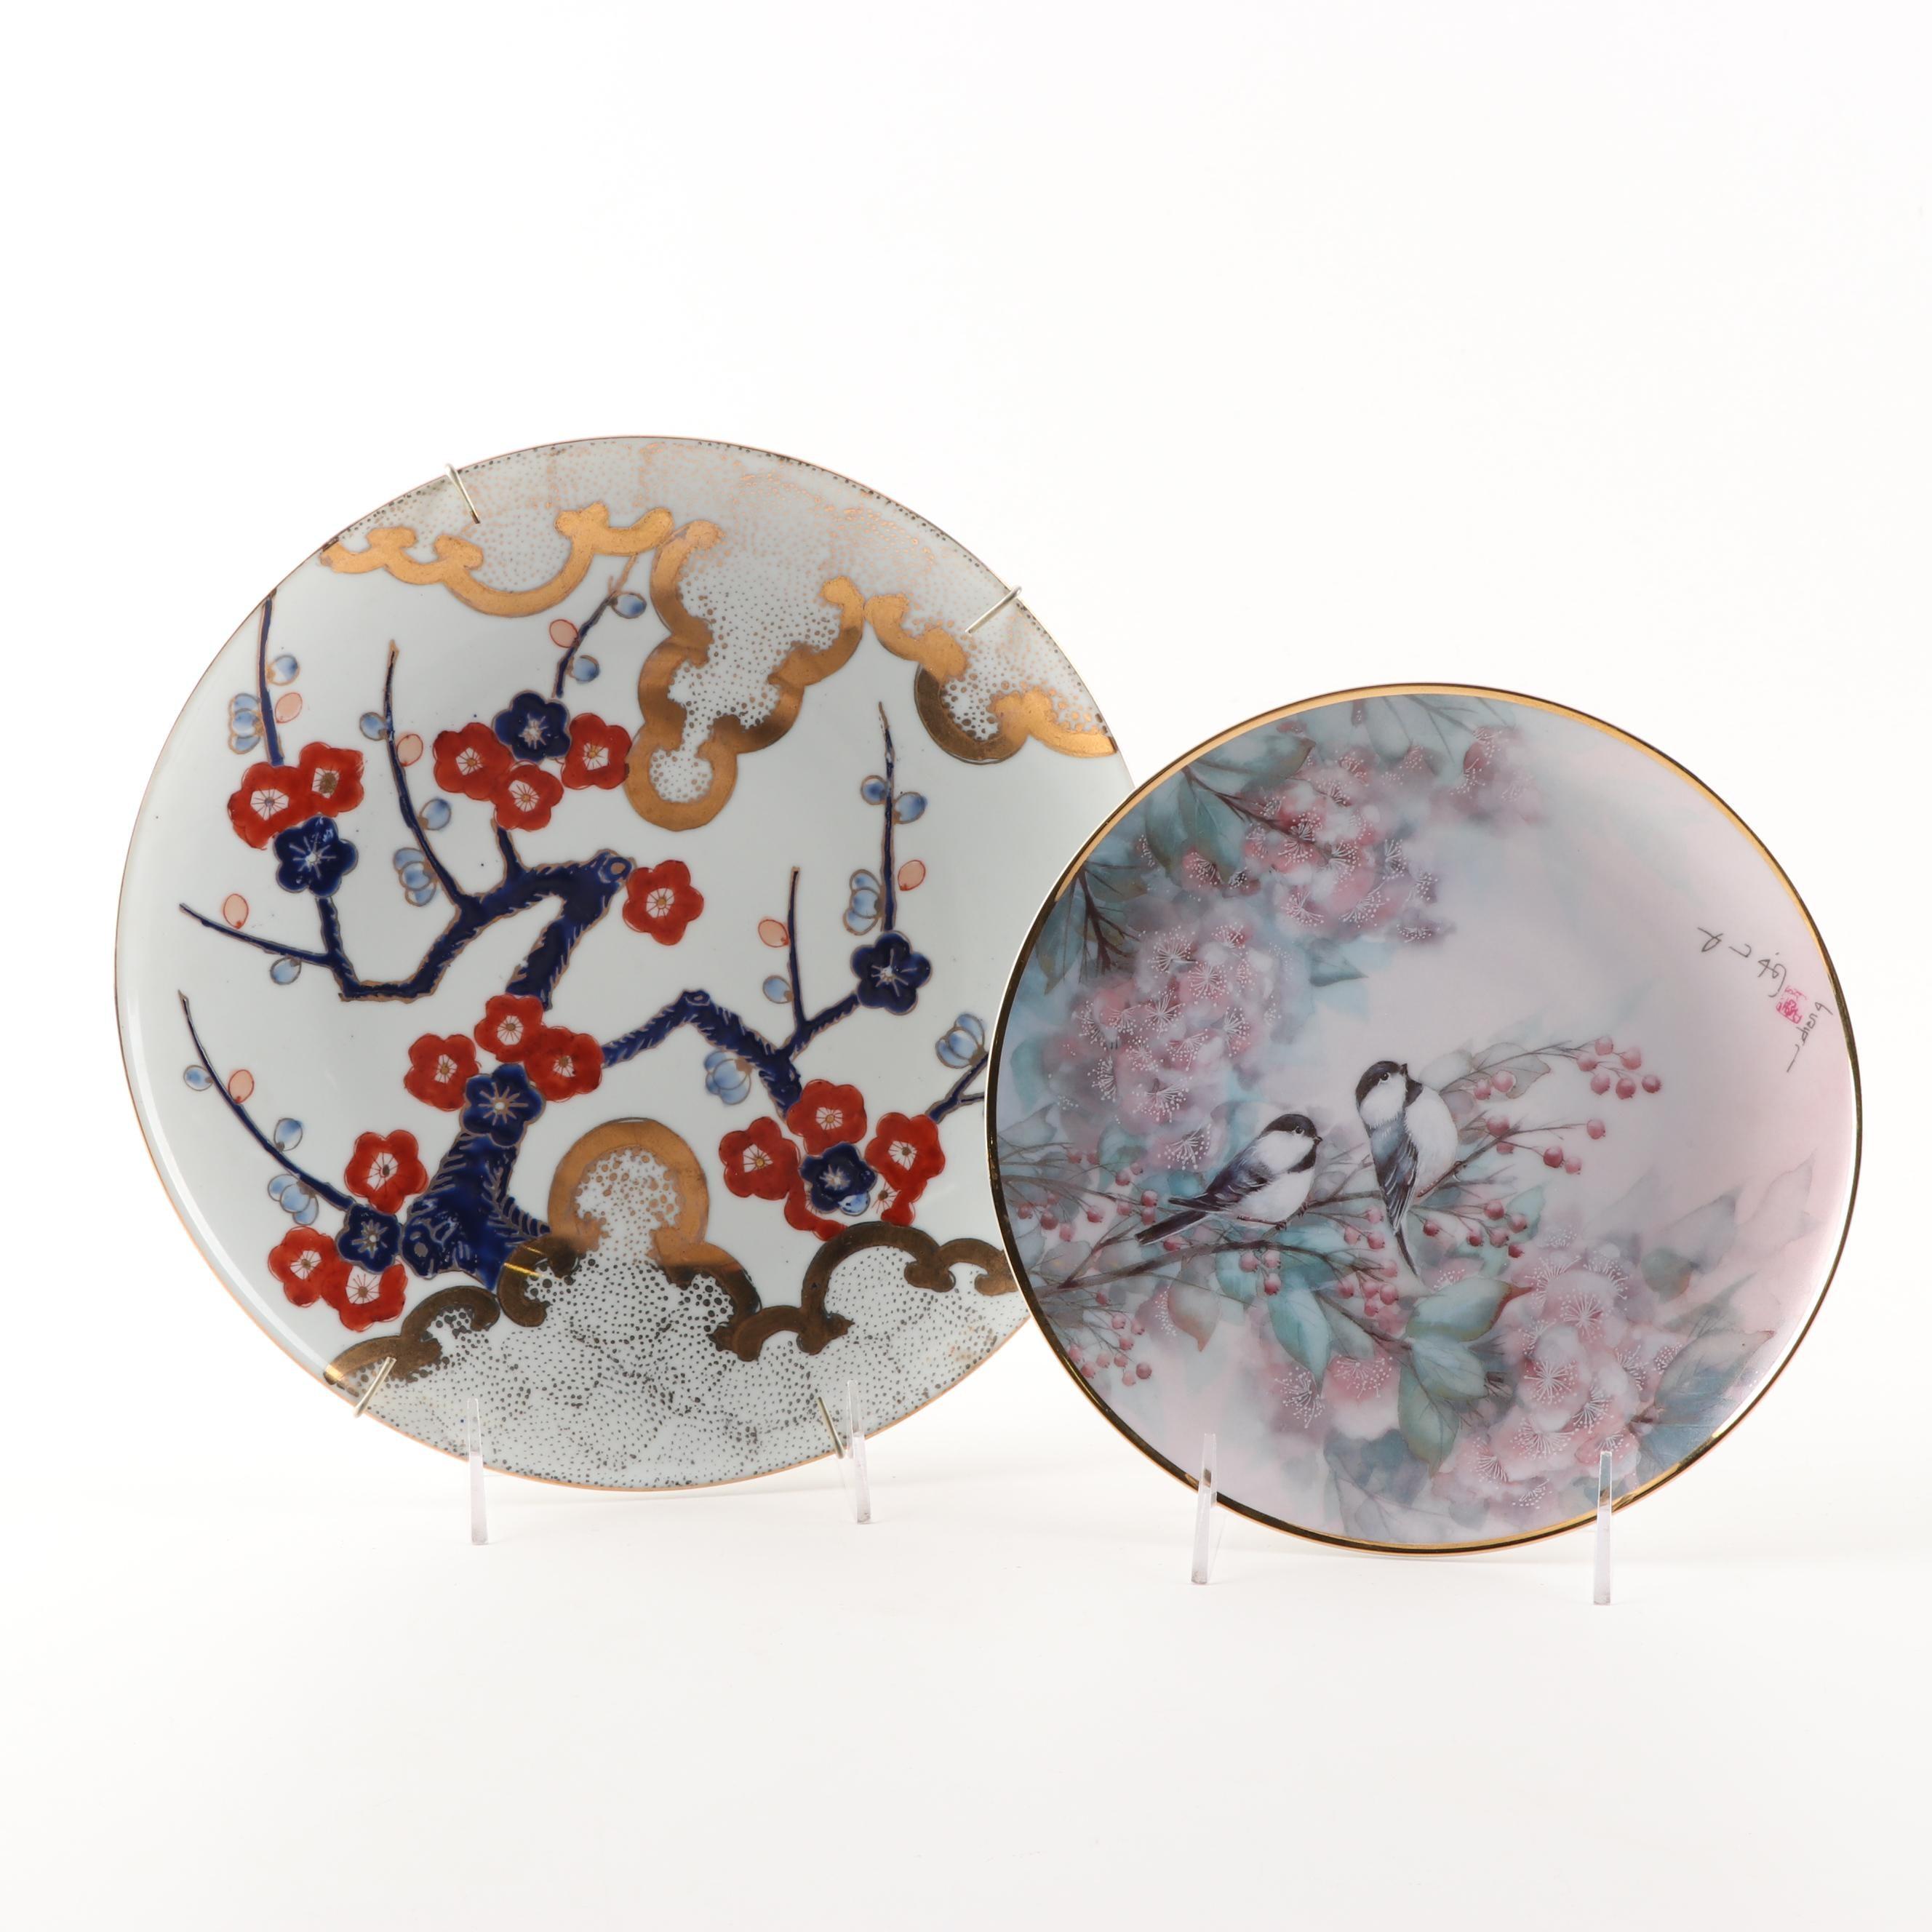 Chinese Porcelain Decorative Plates including Franklin Mint